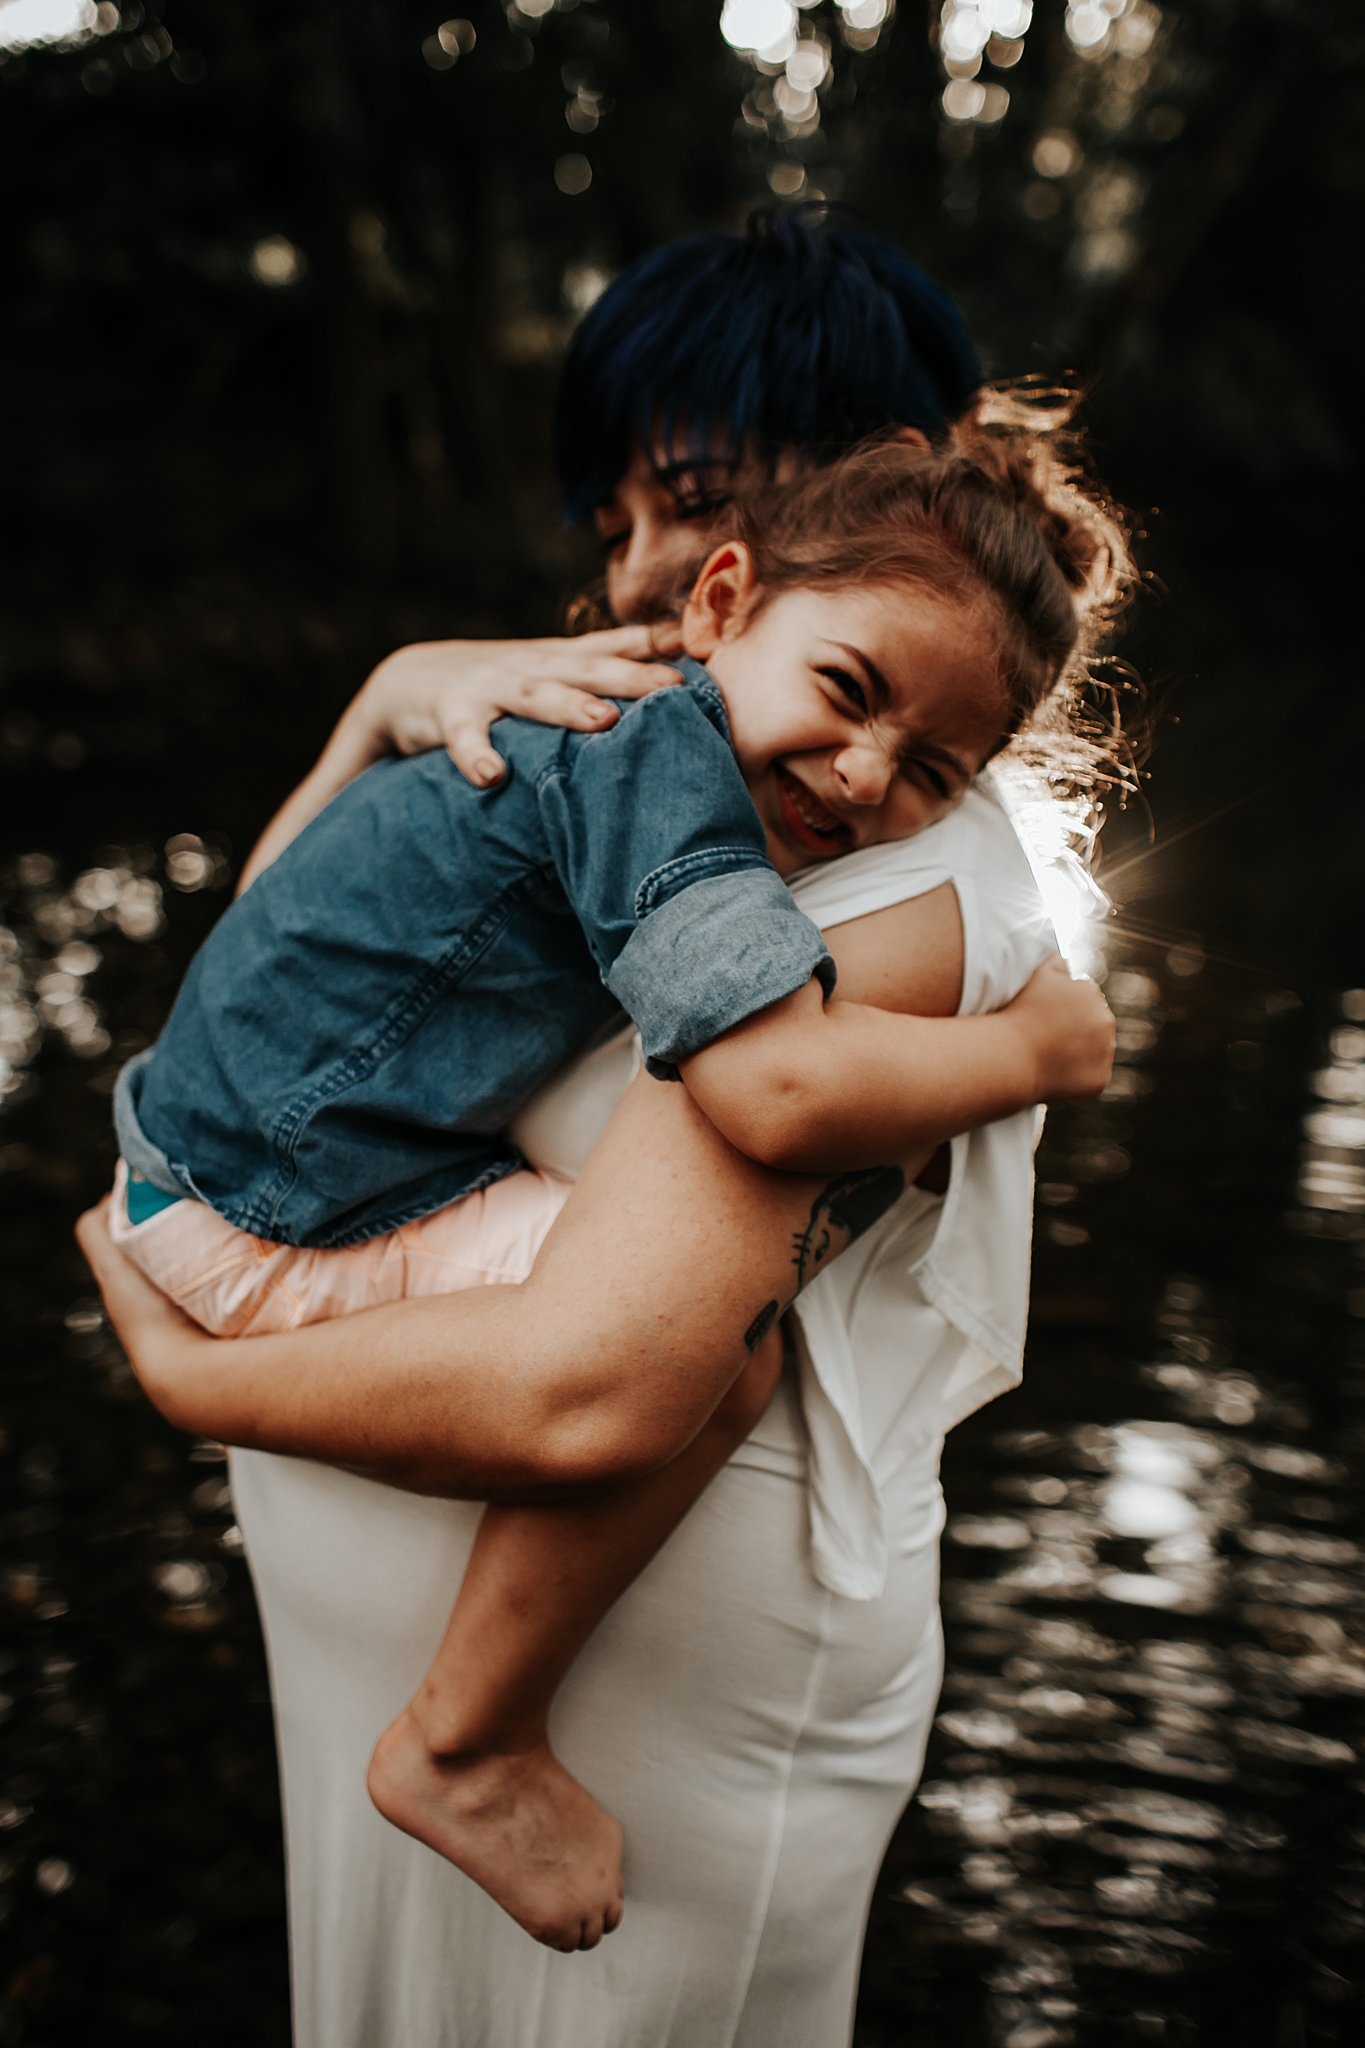 Meagan-San-Antonio-Maternity-Photographer-14_WEB.jpg